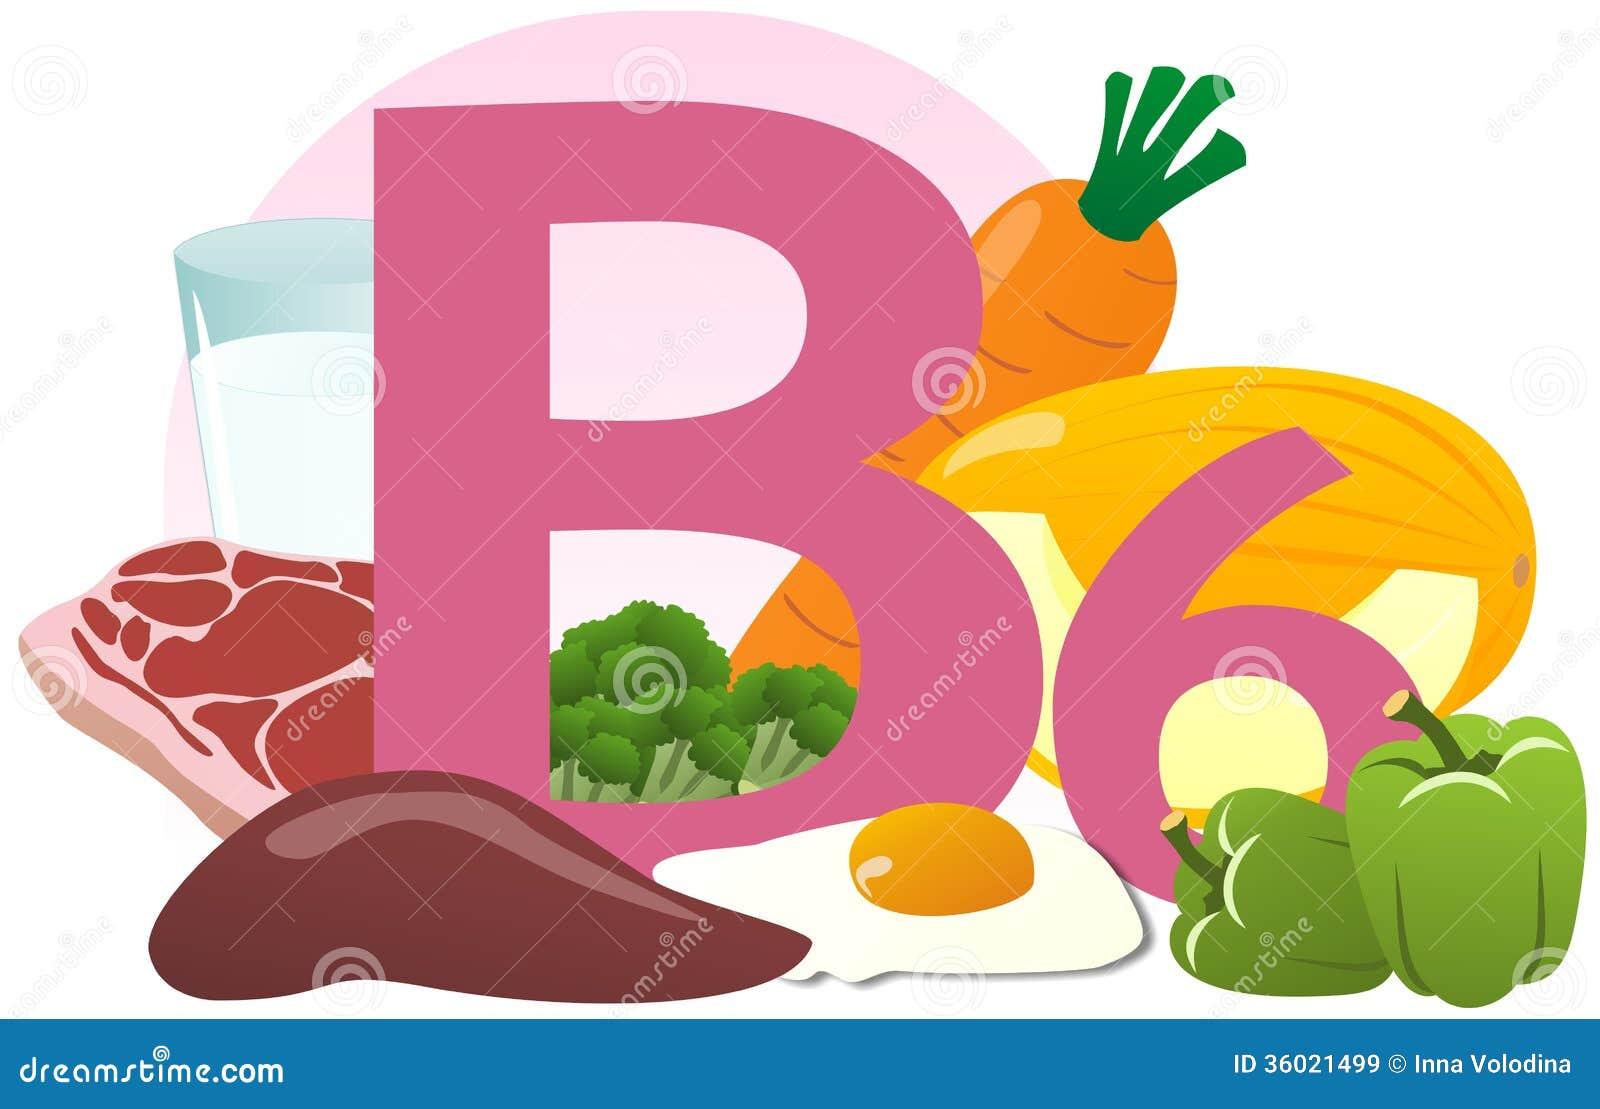 vitamina b2 y b6 alimentos